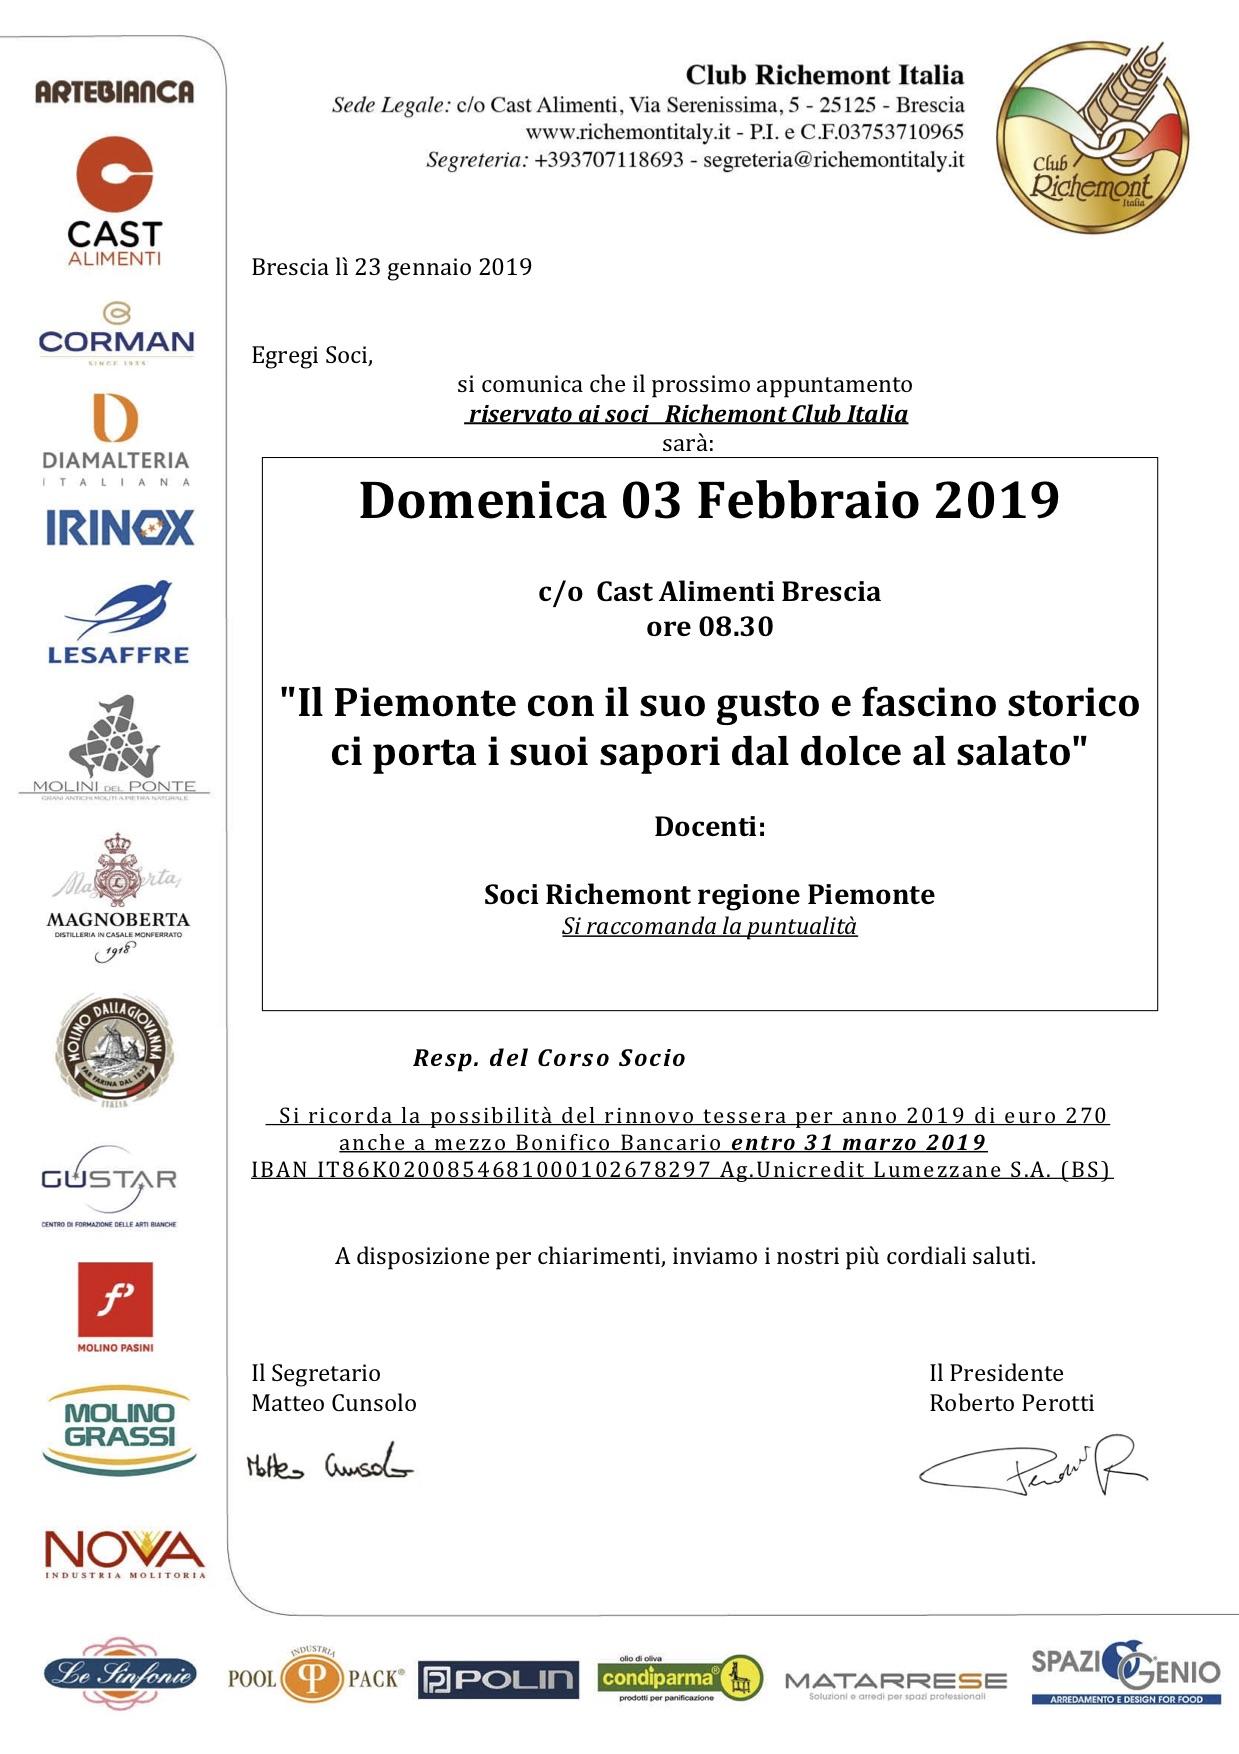 incontro-03_02_19-sede-nord-regione-piemonte